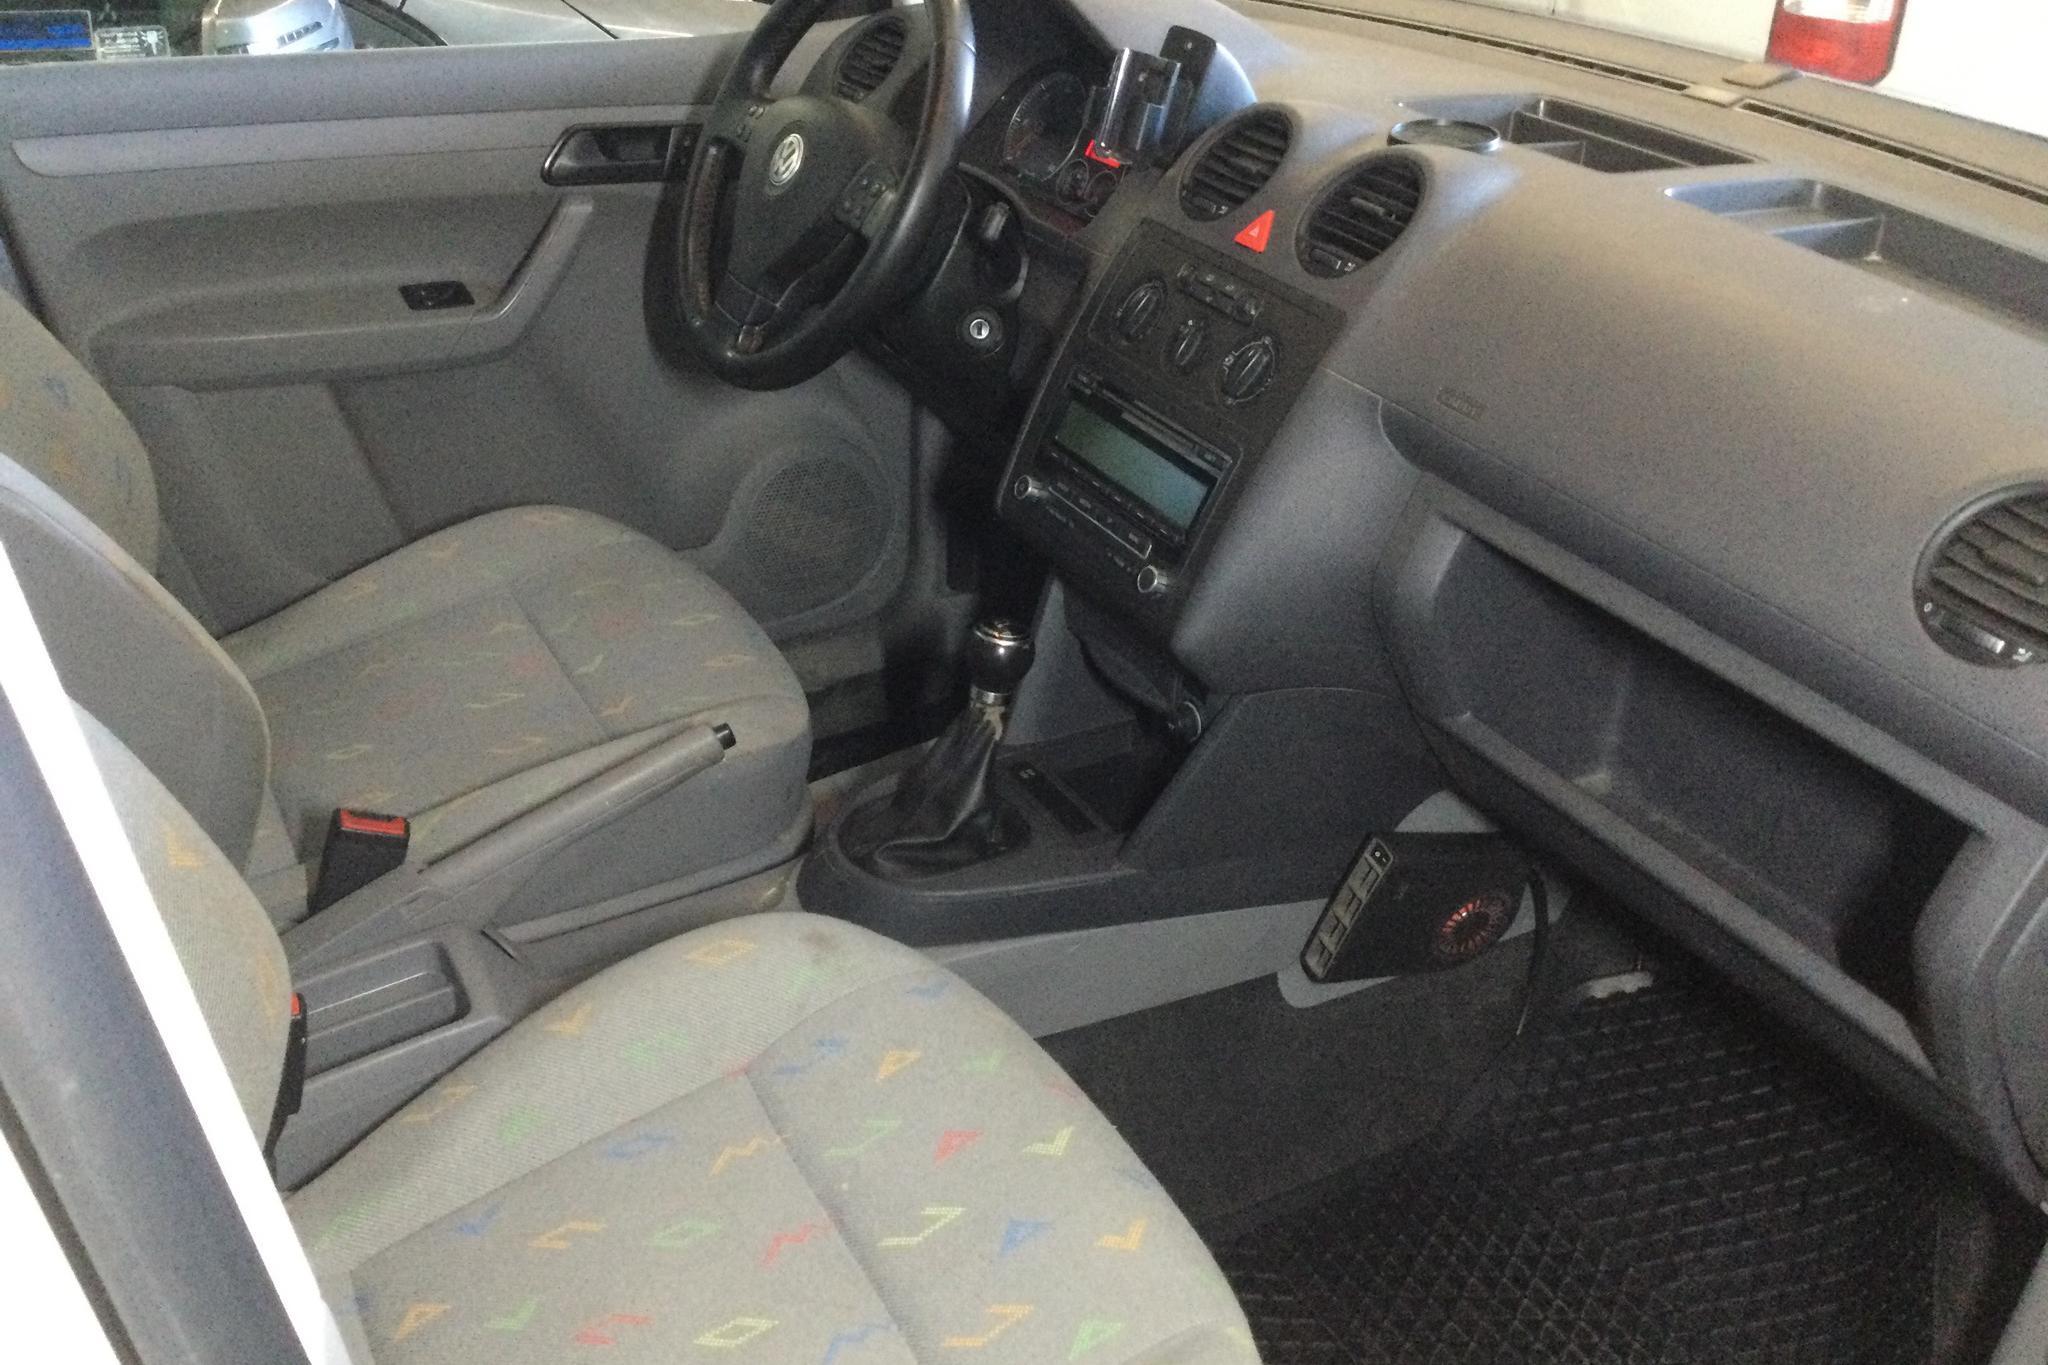 VW Caddy 1.9 TDI Skåp 4motion (105hk) - 22 377 mil - Manuell - vit - 2010